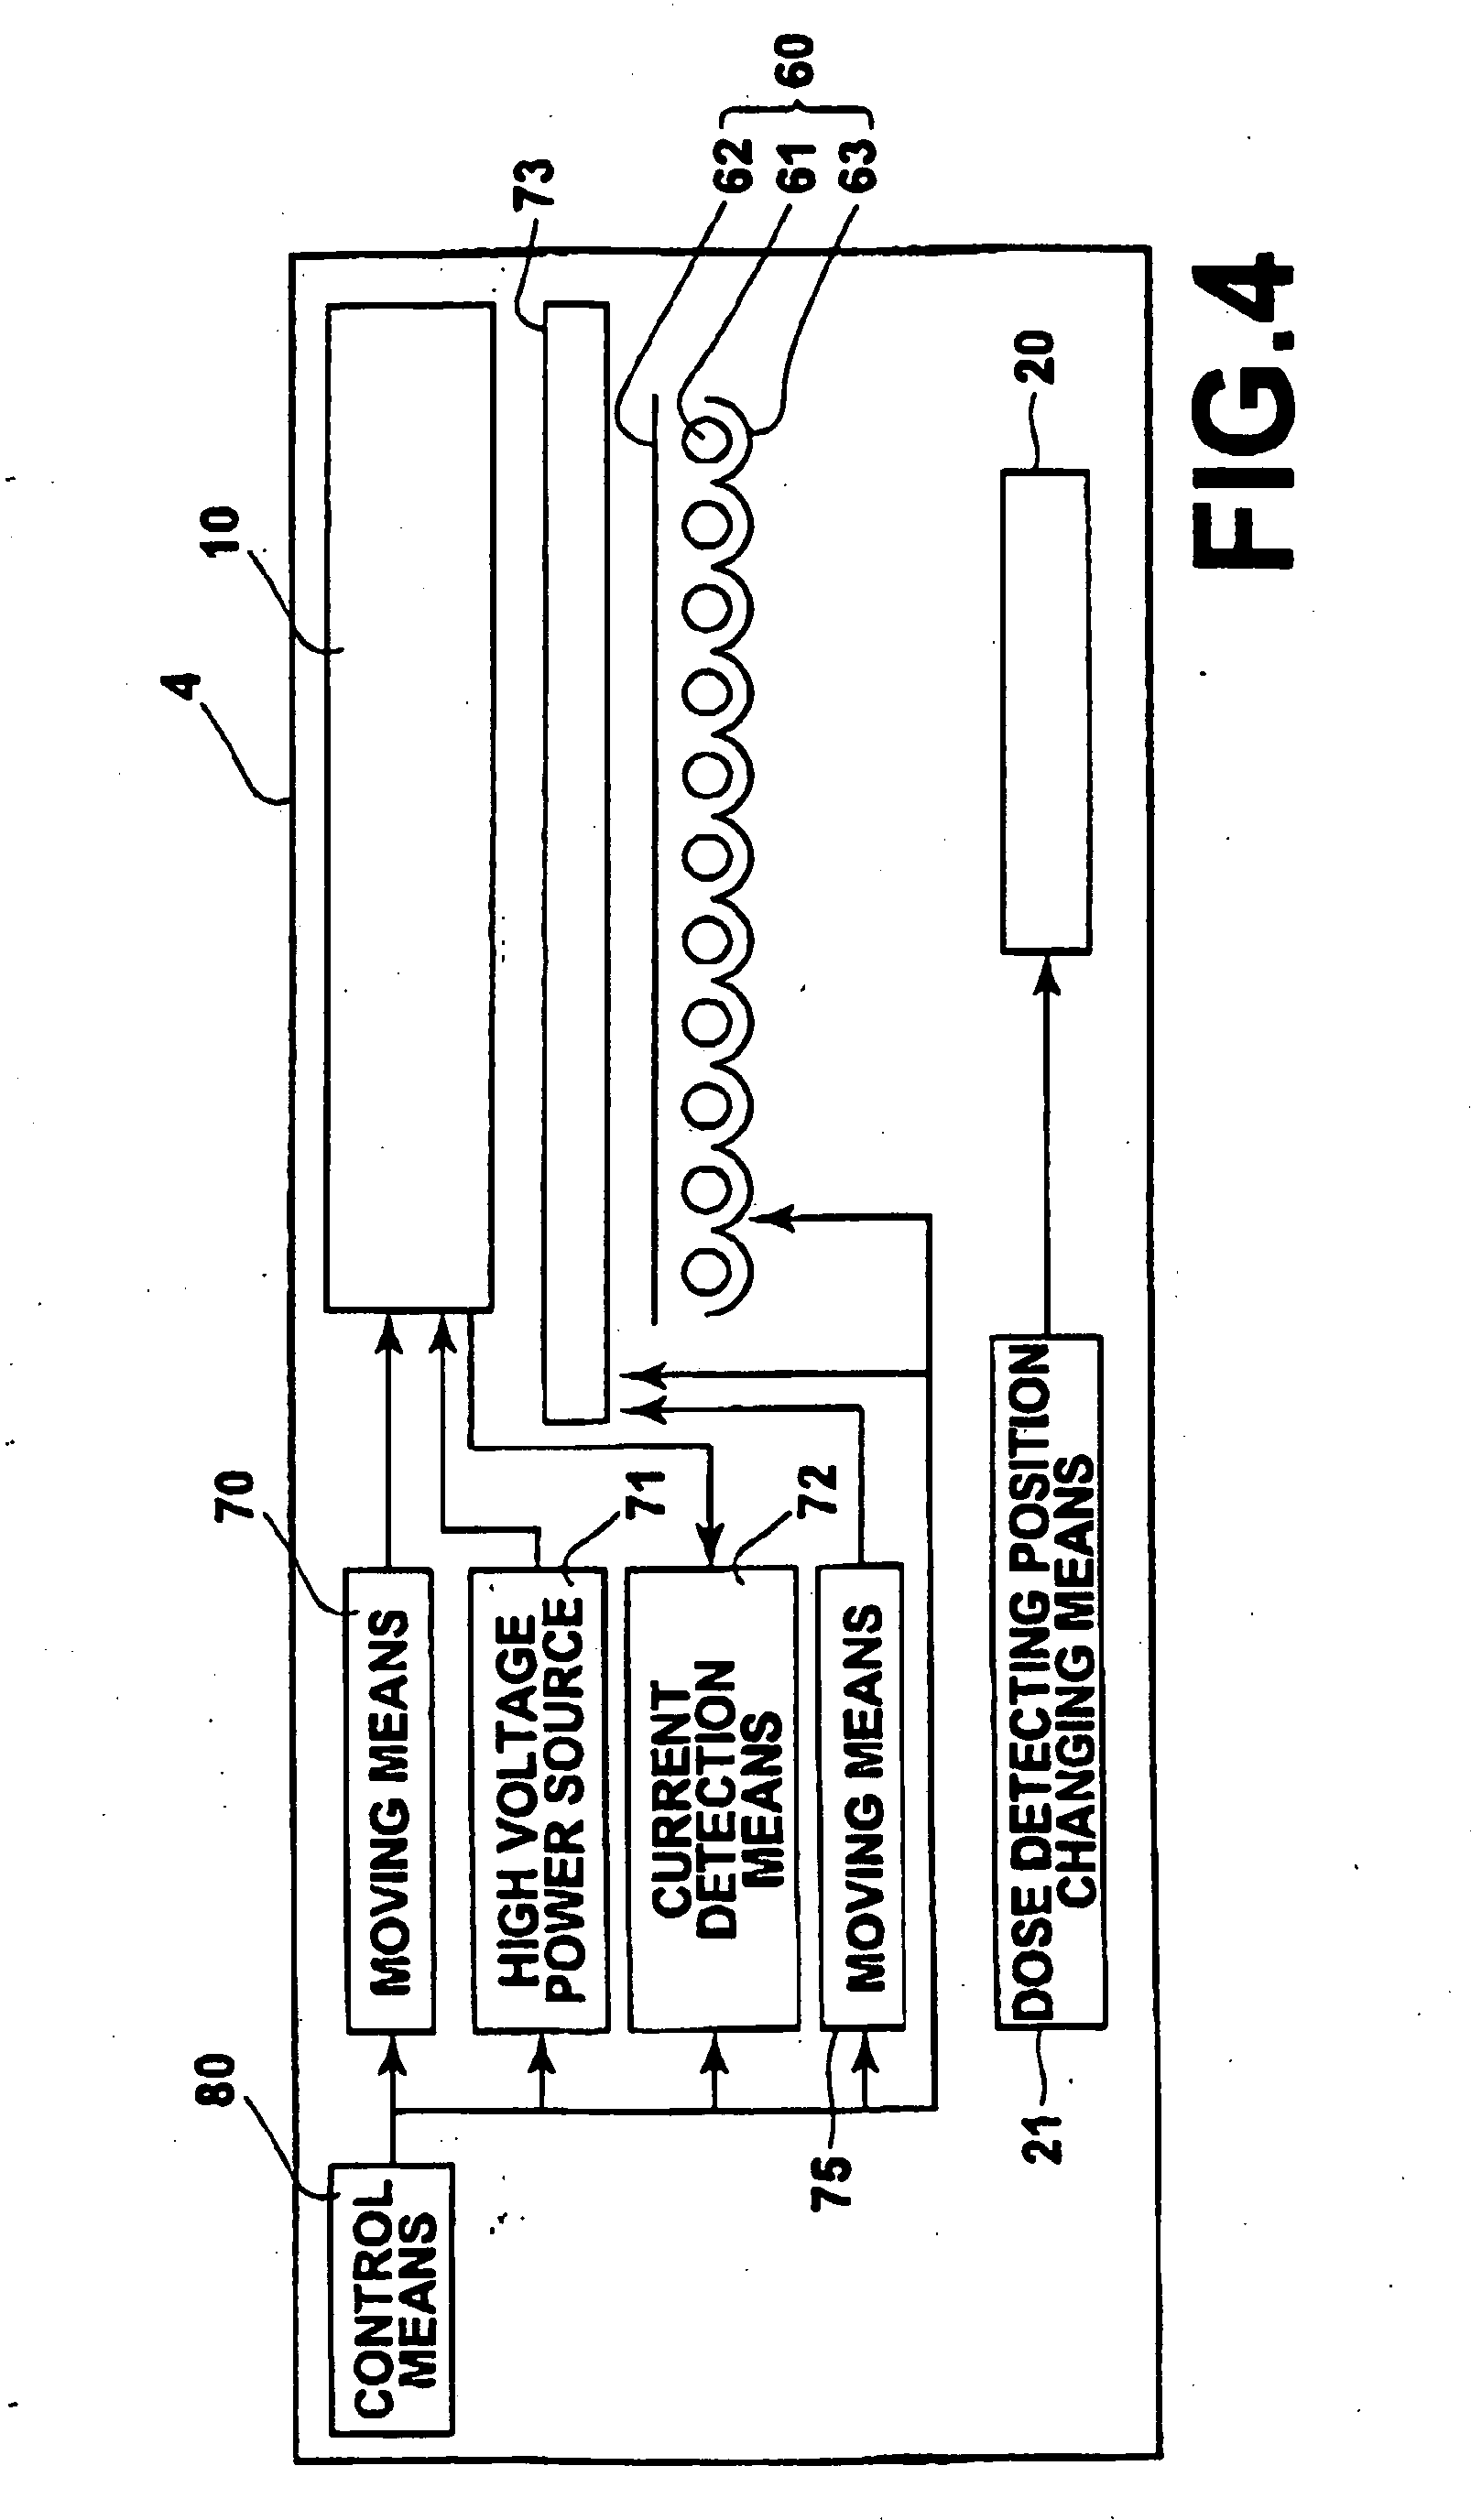 mamky02s电路图